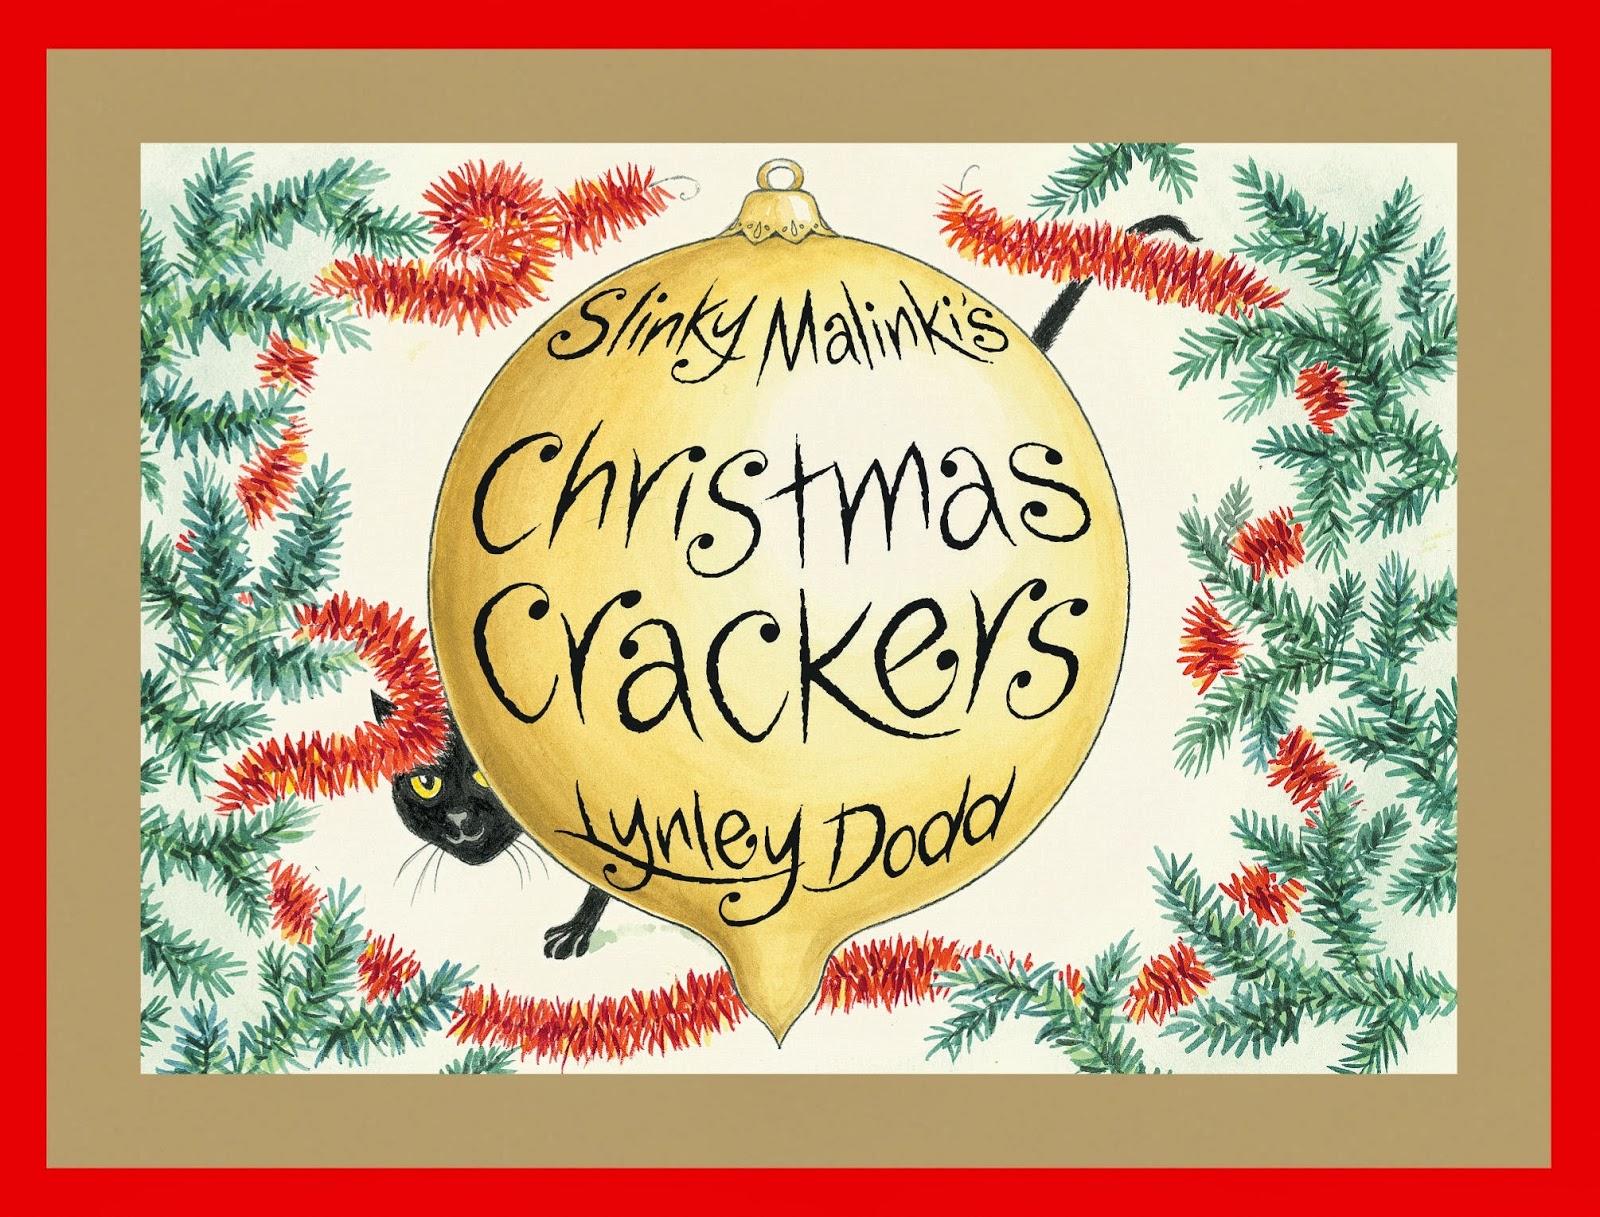 Slinky Malinki's Christmas Crackers By